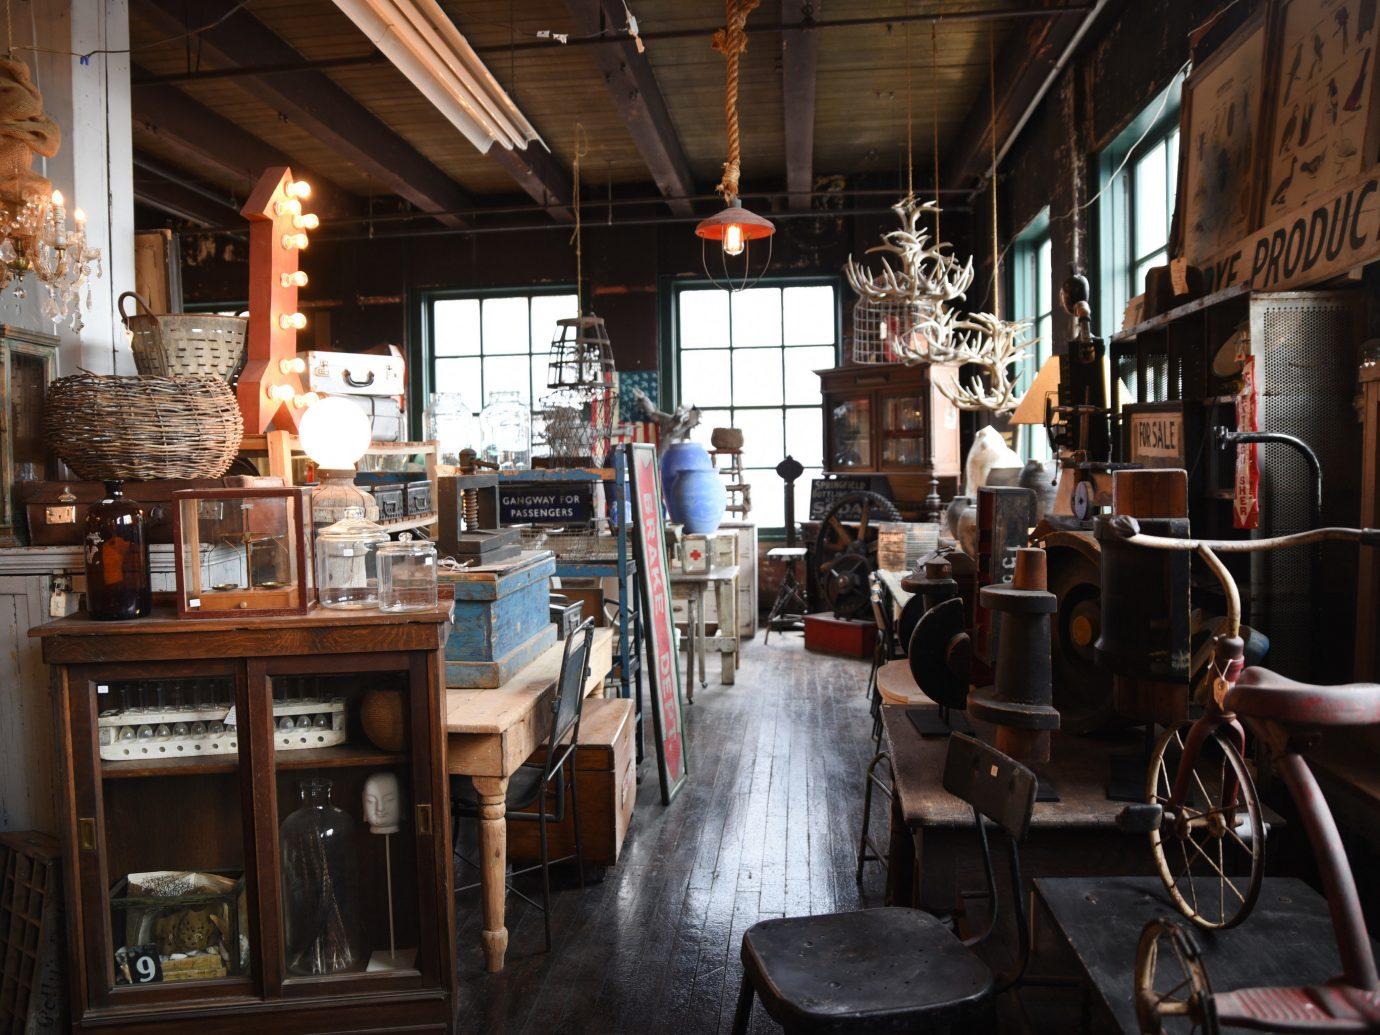 Trip Ideas indoor Boutique interior design tourist attraction cluttered